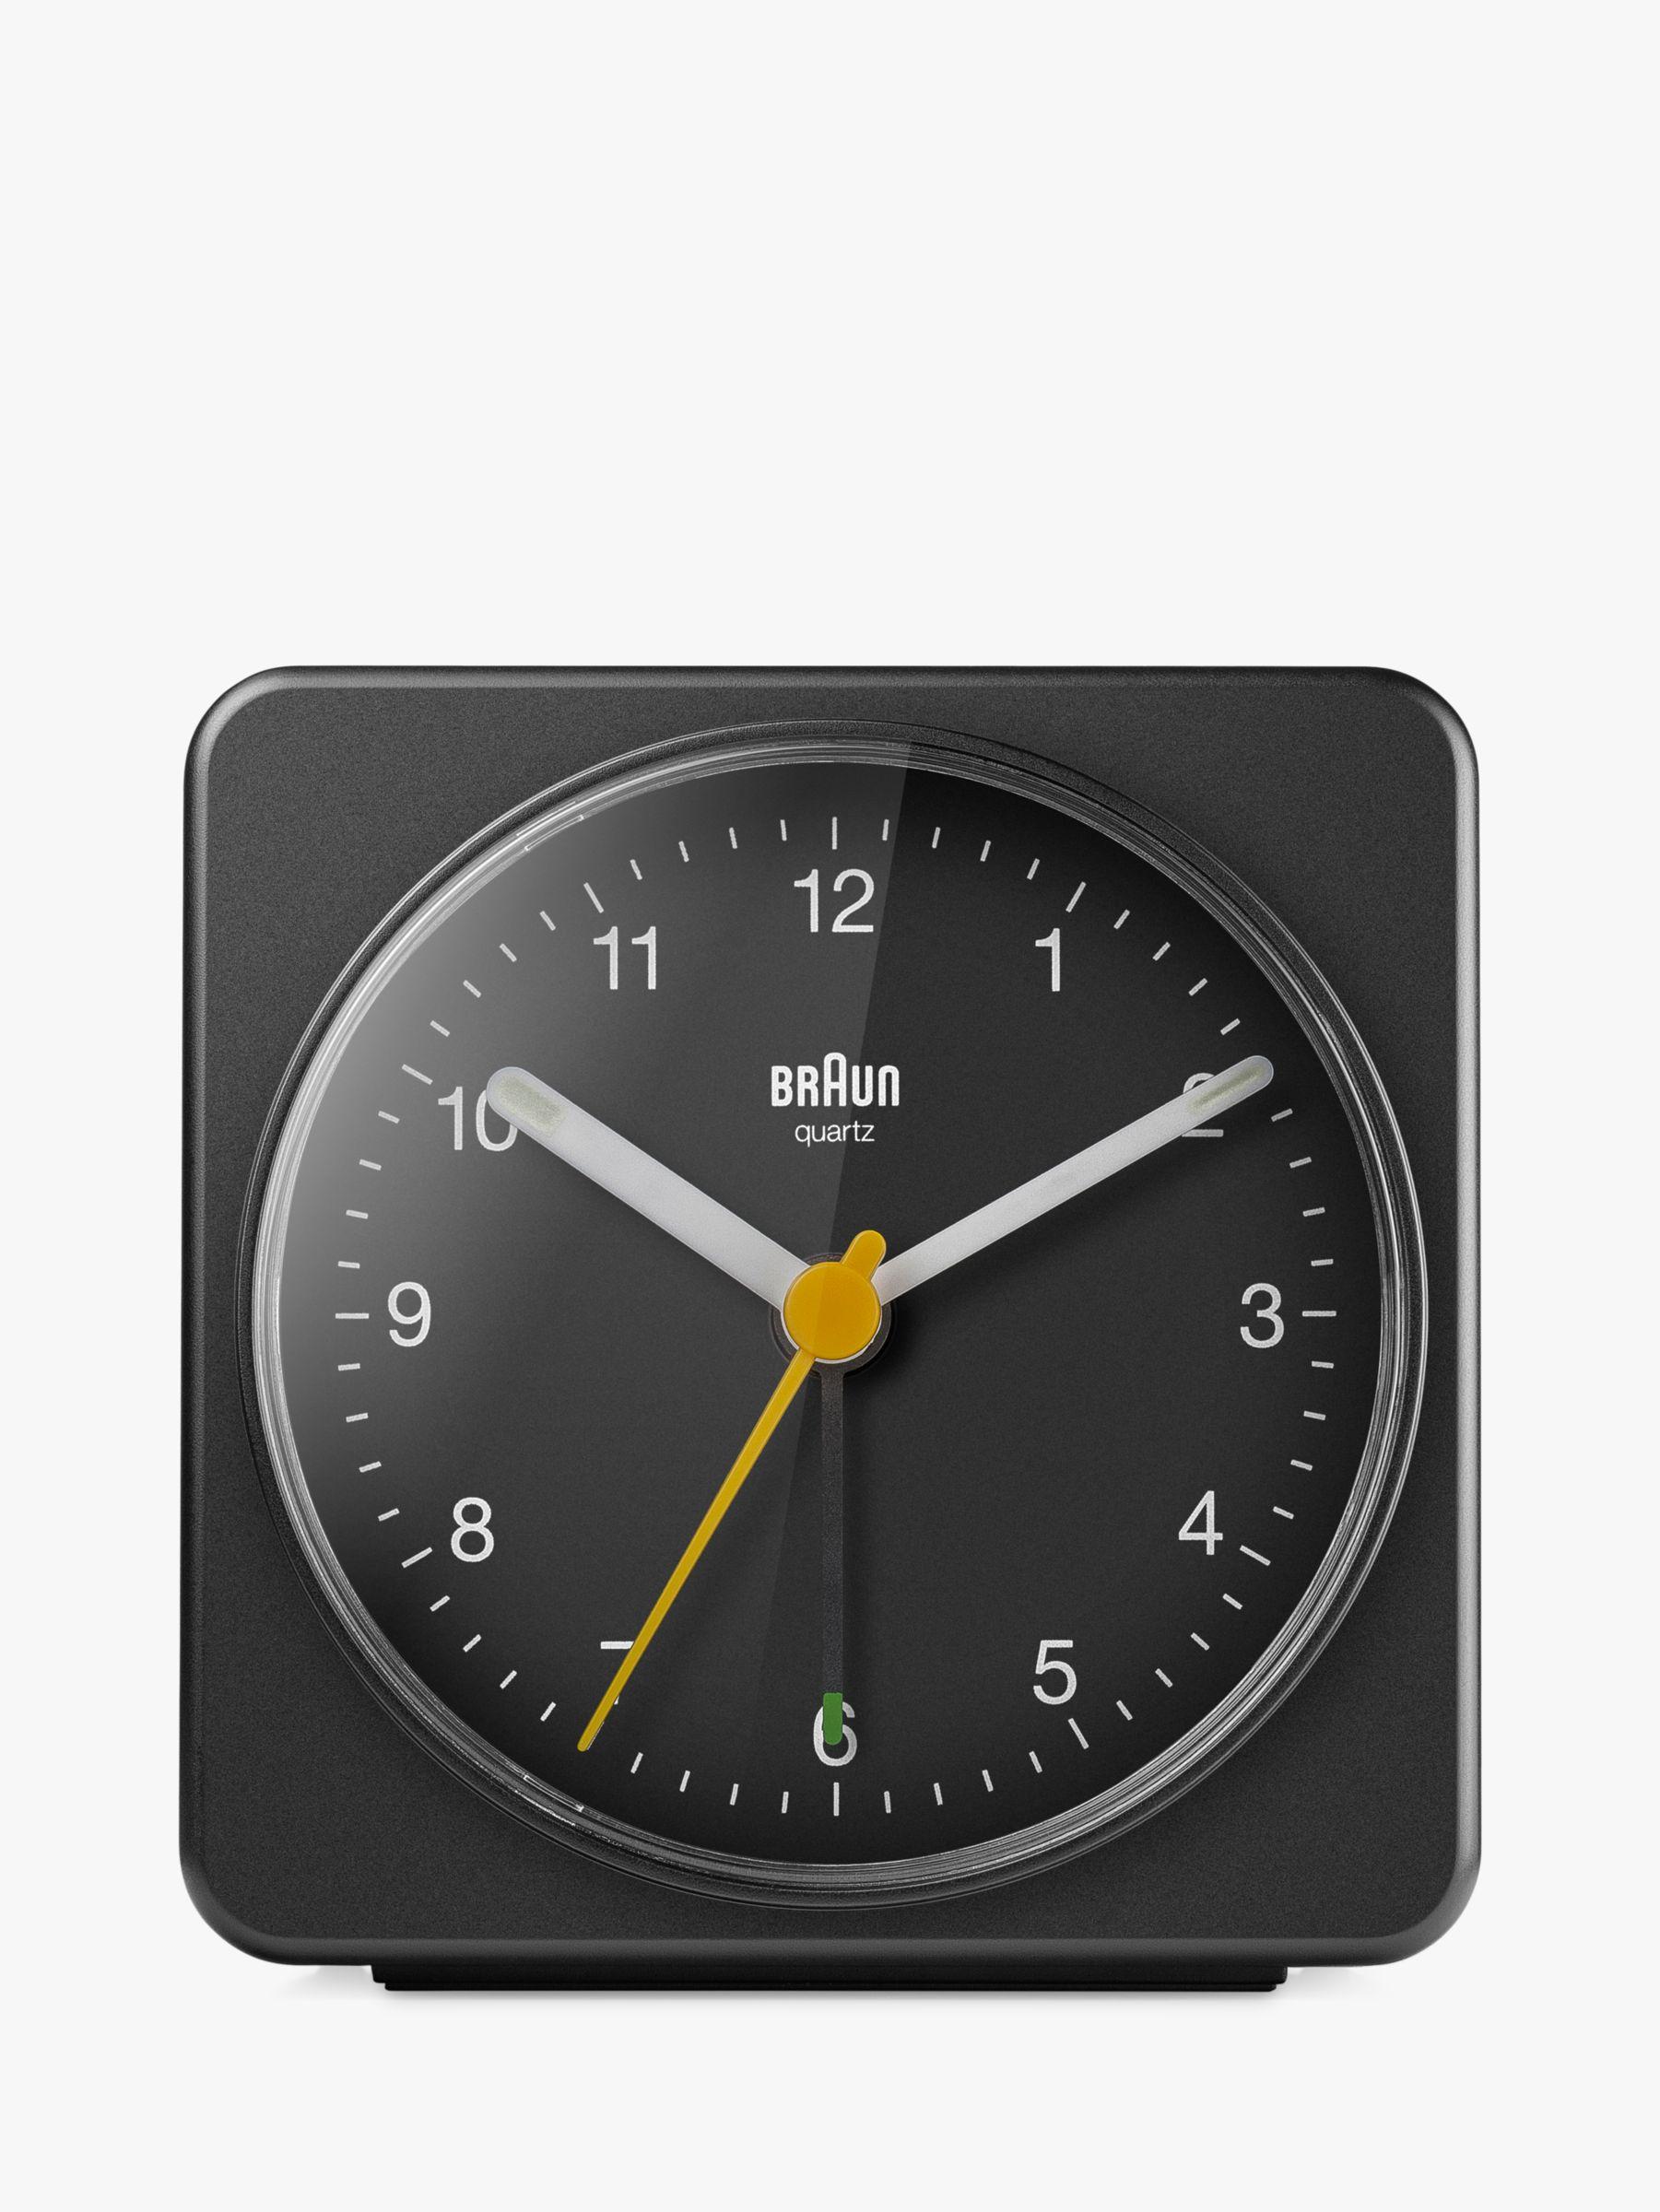 Braun Braun Analogue Alarm Clock, Black